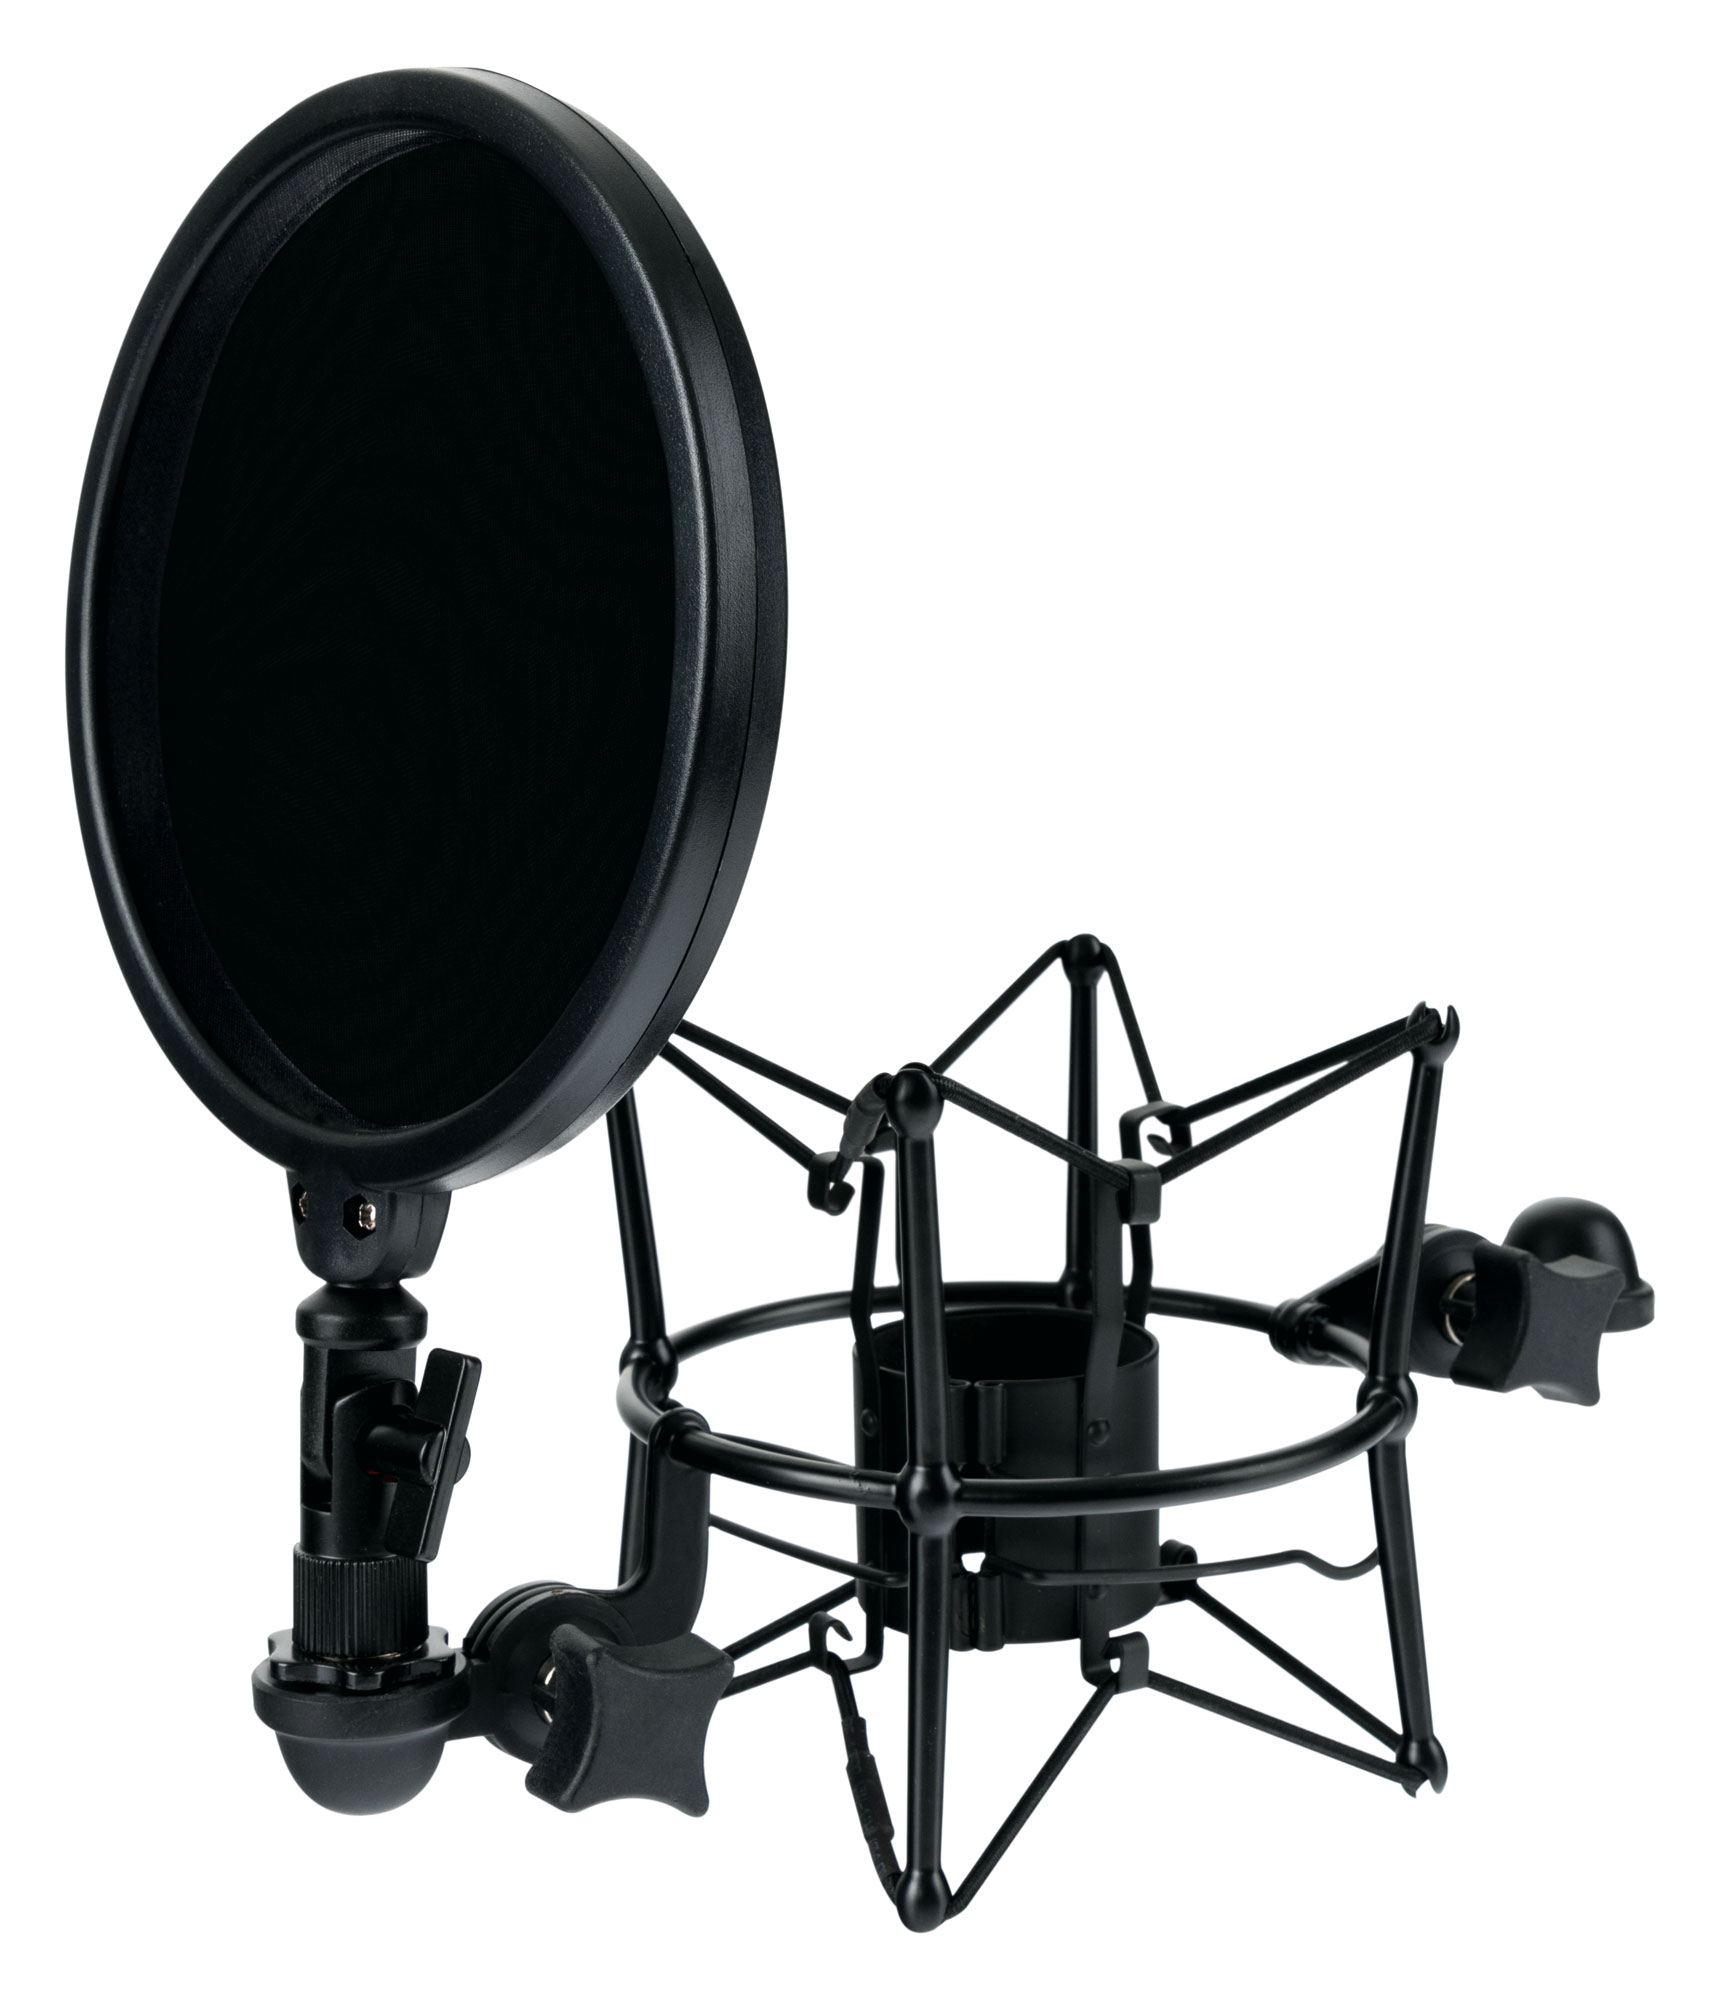 Pronomic MSP 45 Mikrofonspinne mit Popschutz 45 52mm Retoure (Zustand sehr gut)